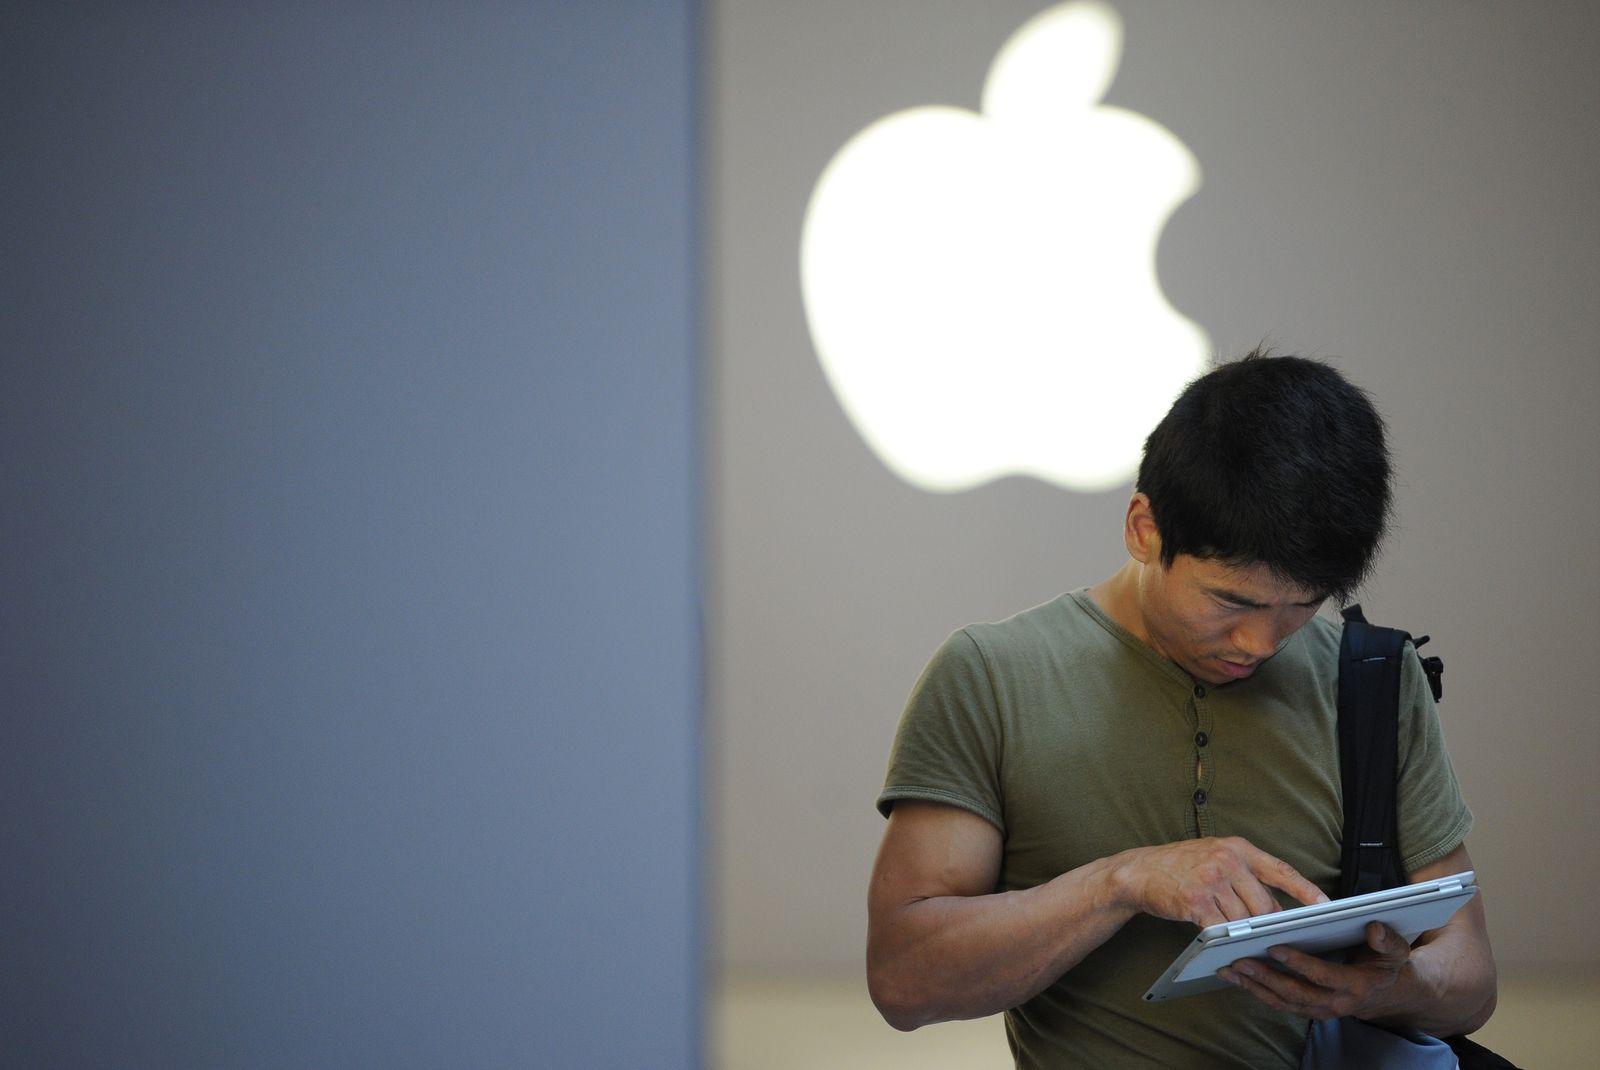 CHINA-US-LABOUR-RIGHTS-INTERNET-TELECOM-APPLE Apple